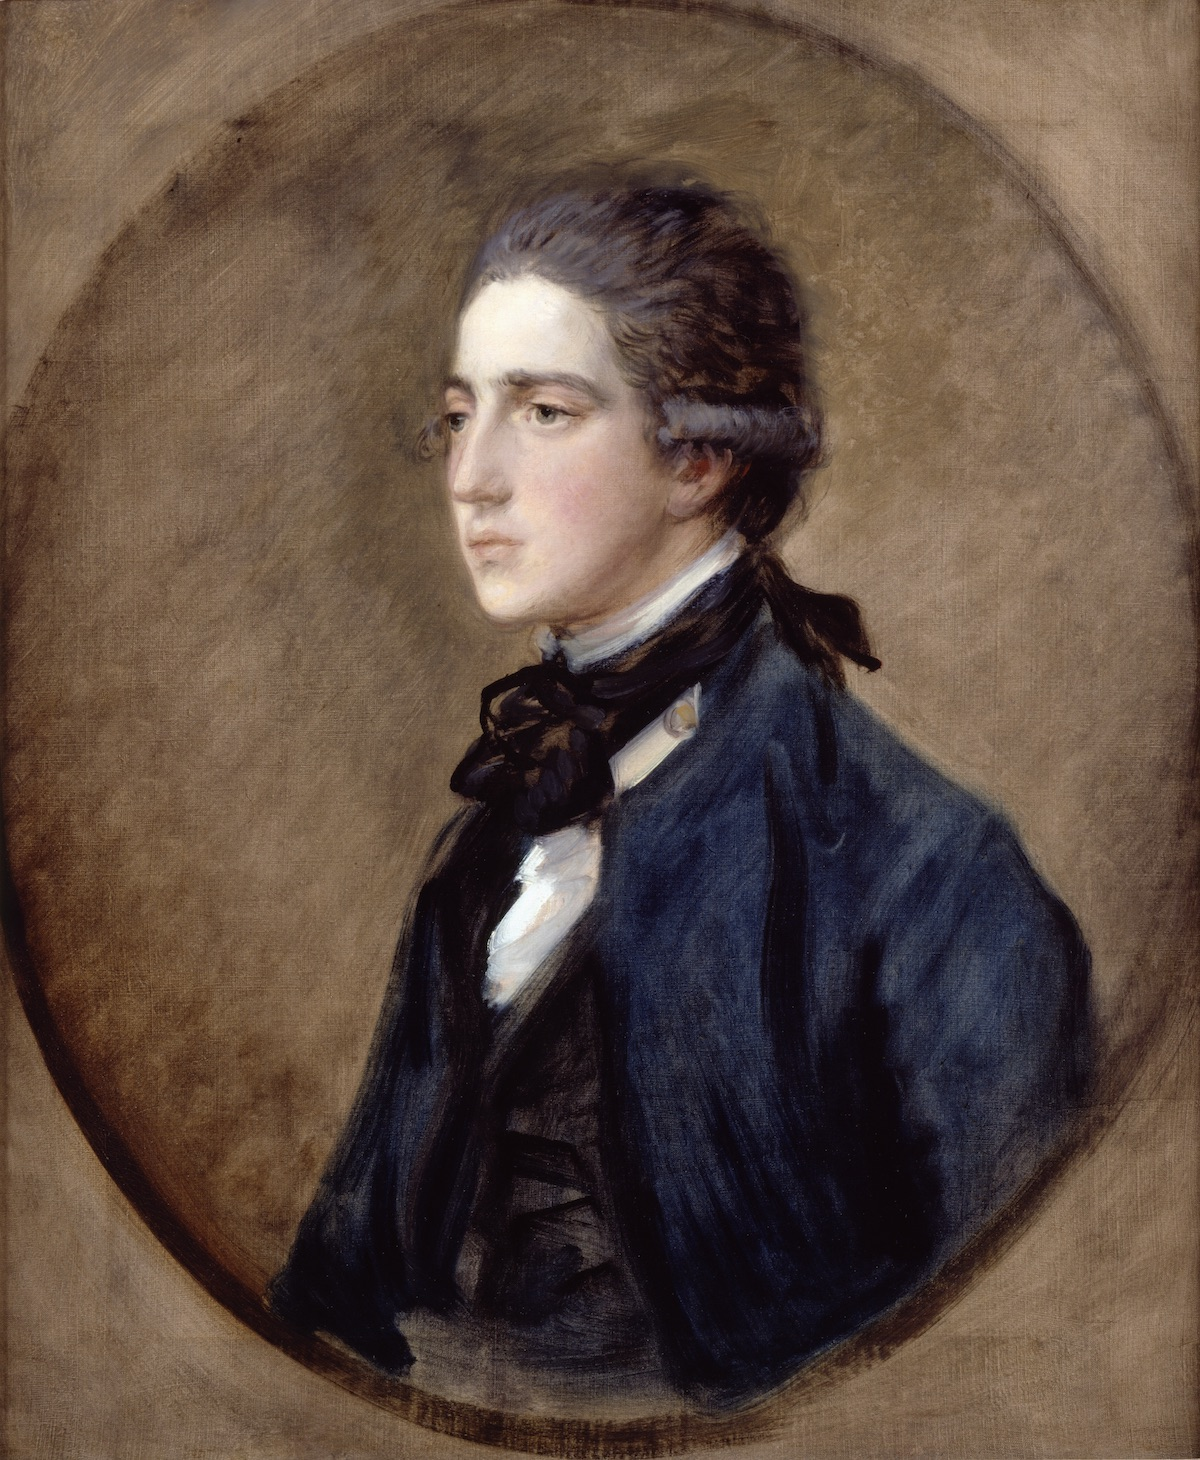 Томас Гейнсборо, «Портрет Самюэля Линли», 1778, Dulwich Picture Gallery, London